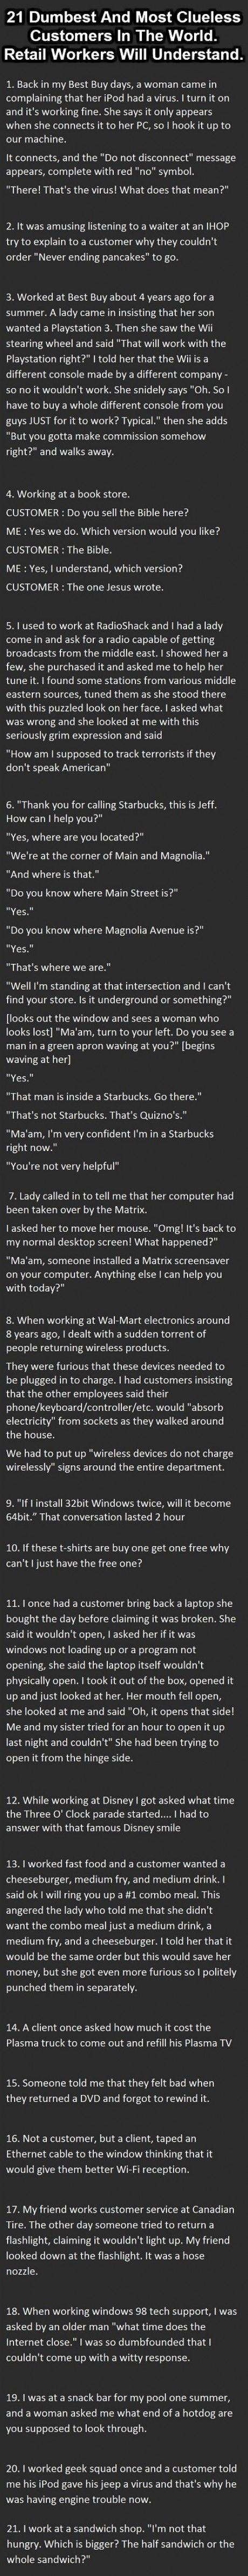 21 Dumbest Customers Ever